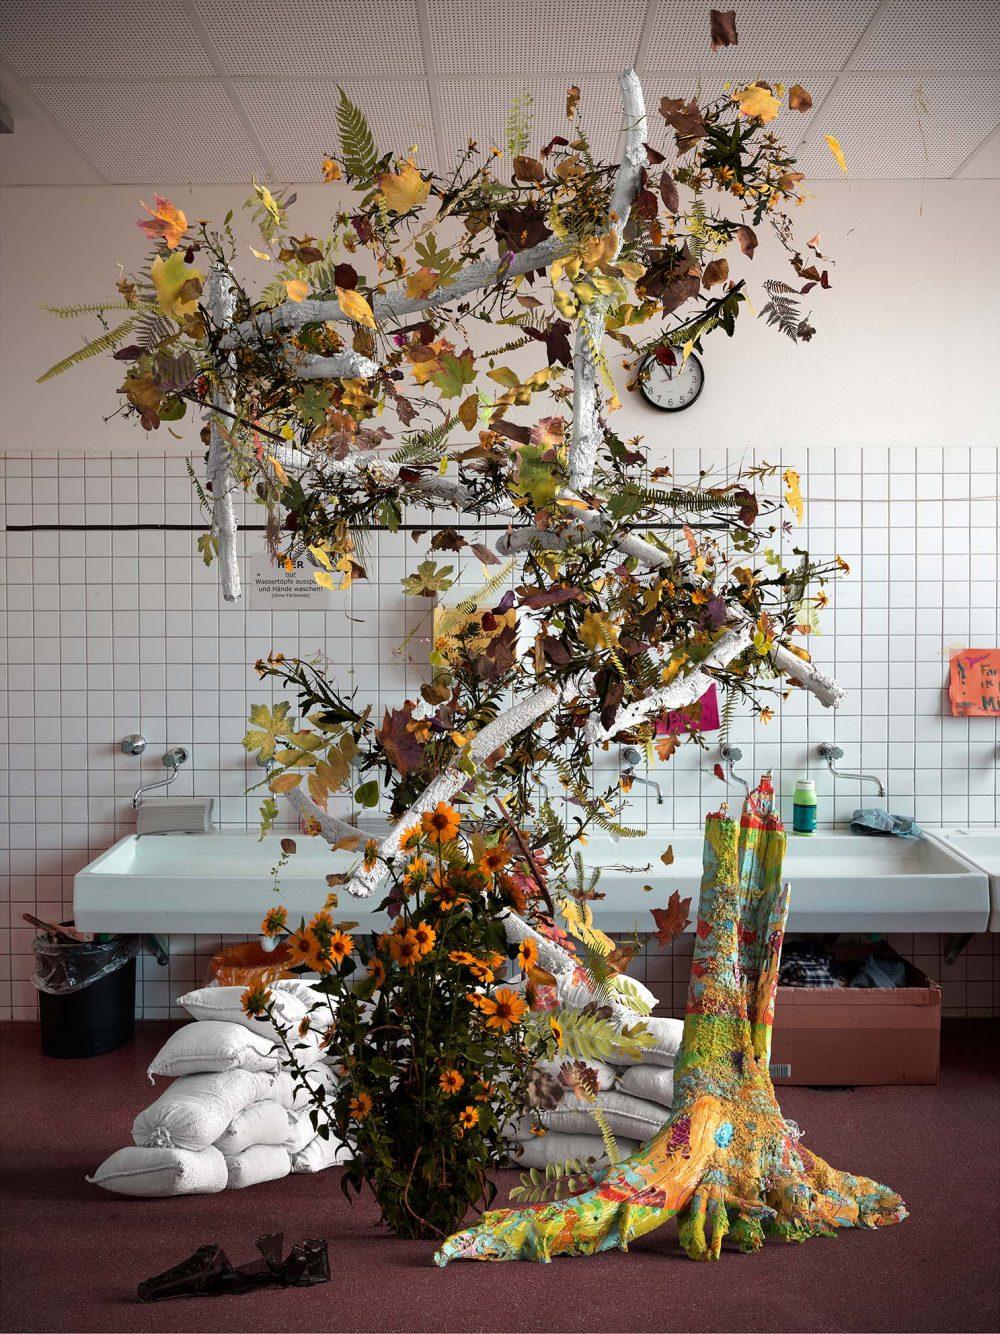 Tim Berresheim - Galerie Falko Alexander gallery - Störgrösse